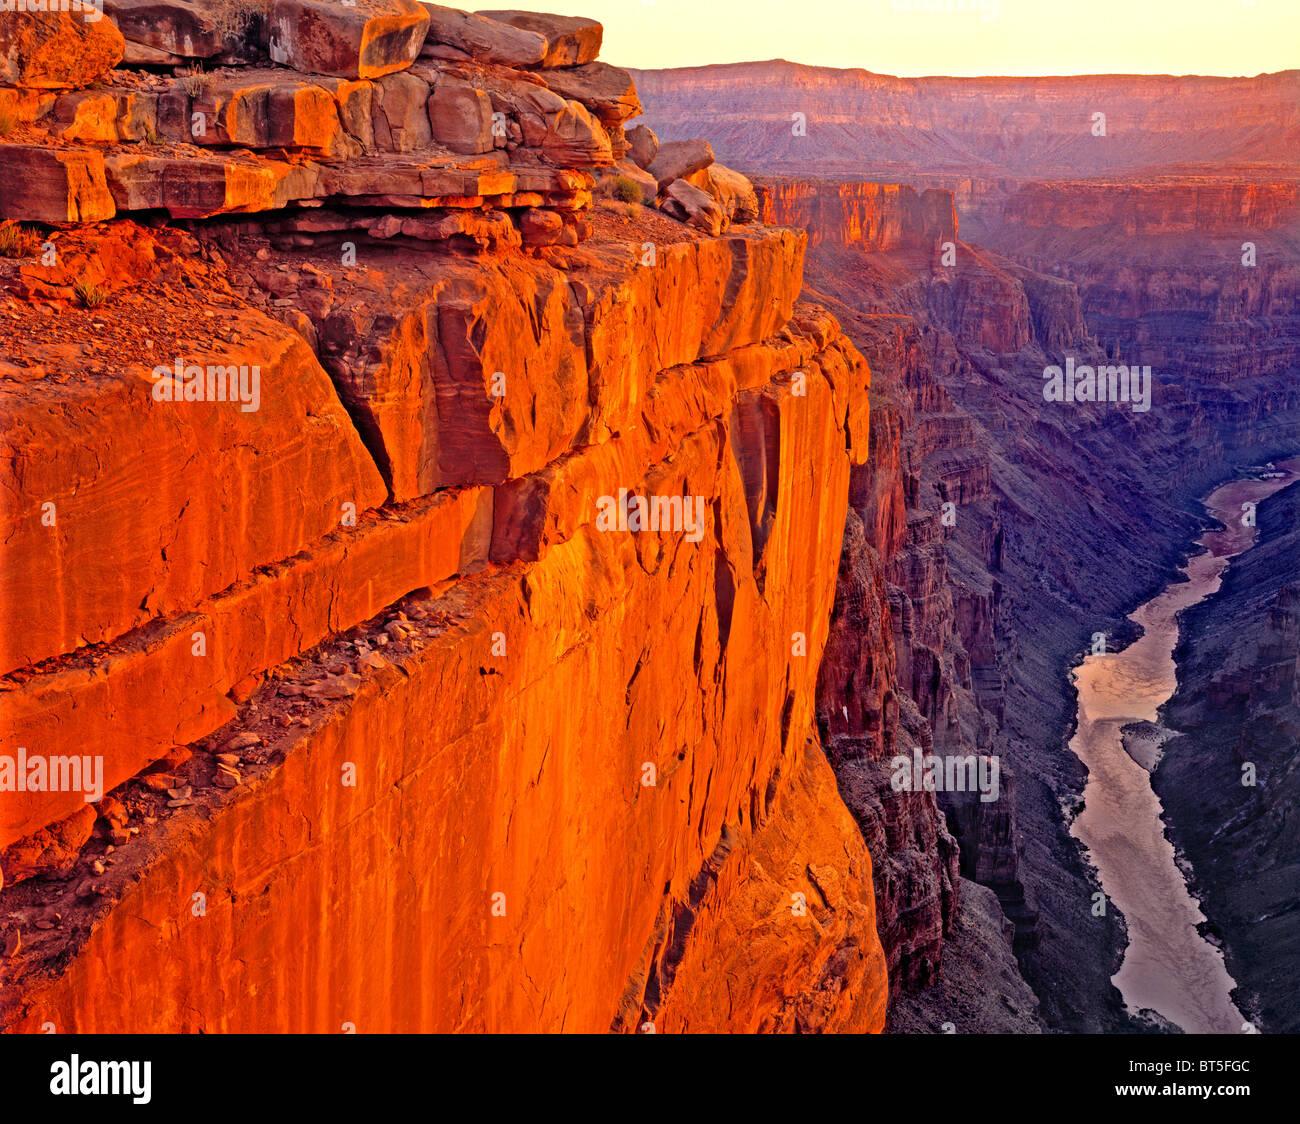 Sonnenaufgang über den Colorado River bei Toroweep, Grand Canyon Nationalpark in Arizona Stockbild